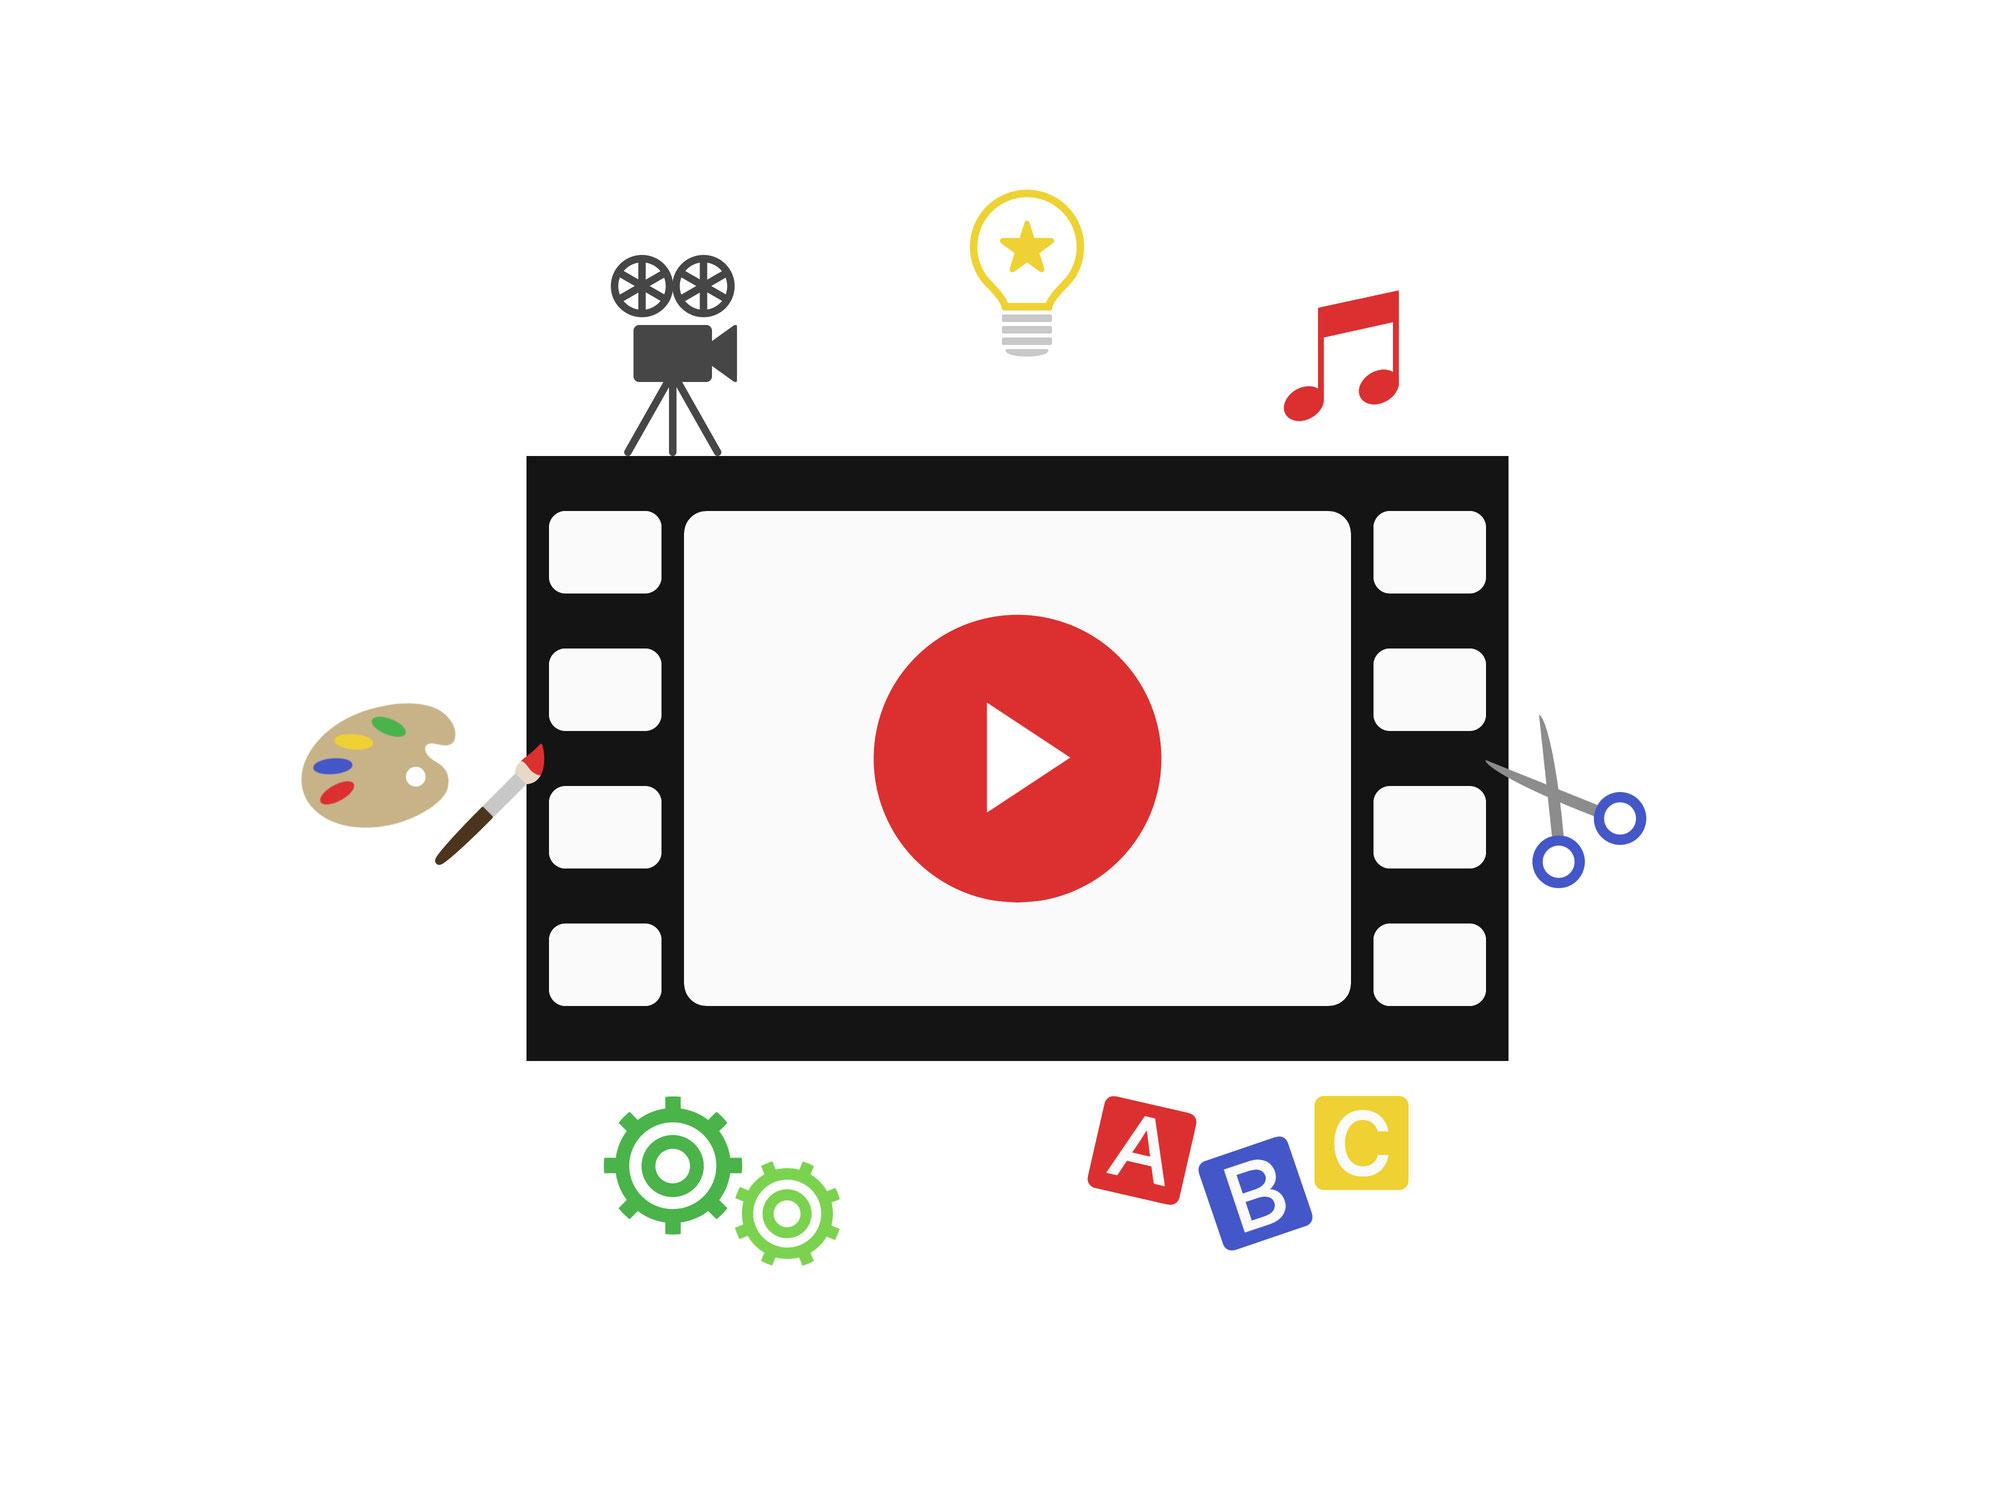 『YouTubeの便利な使い方・動画アップロード』講座(zoom開催)